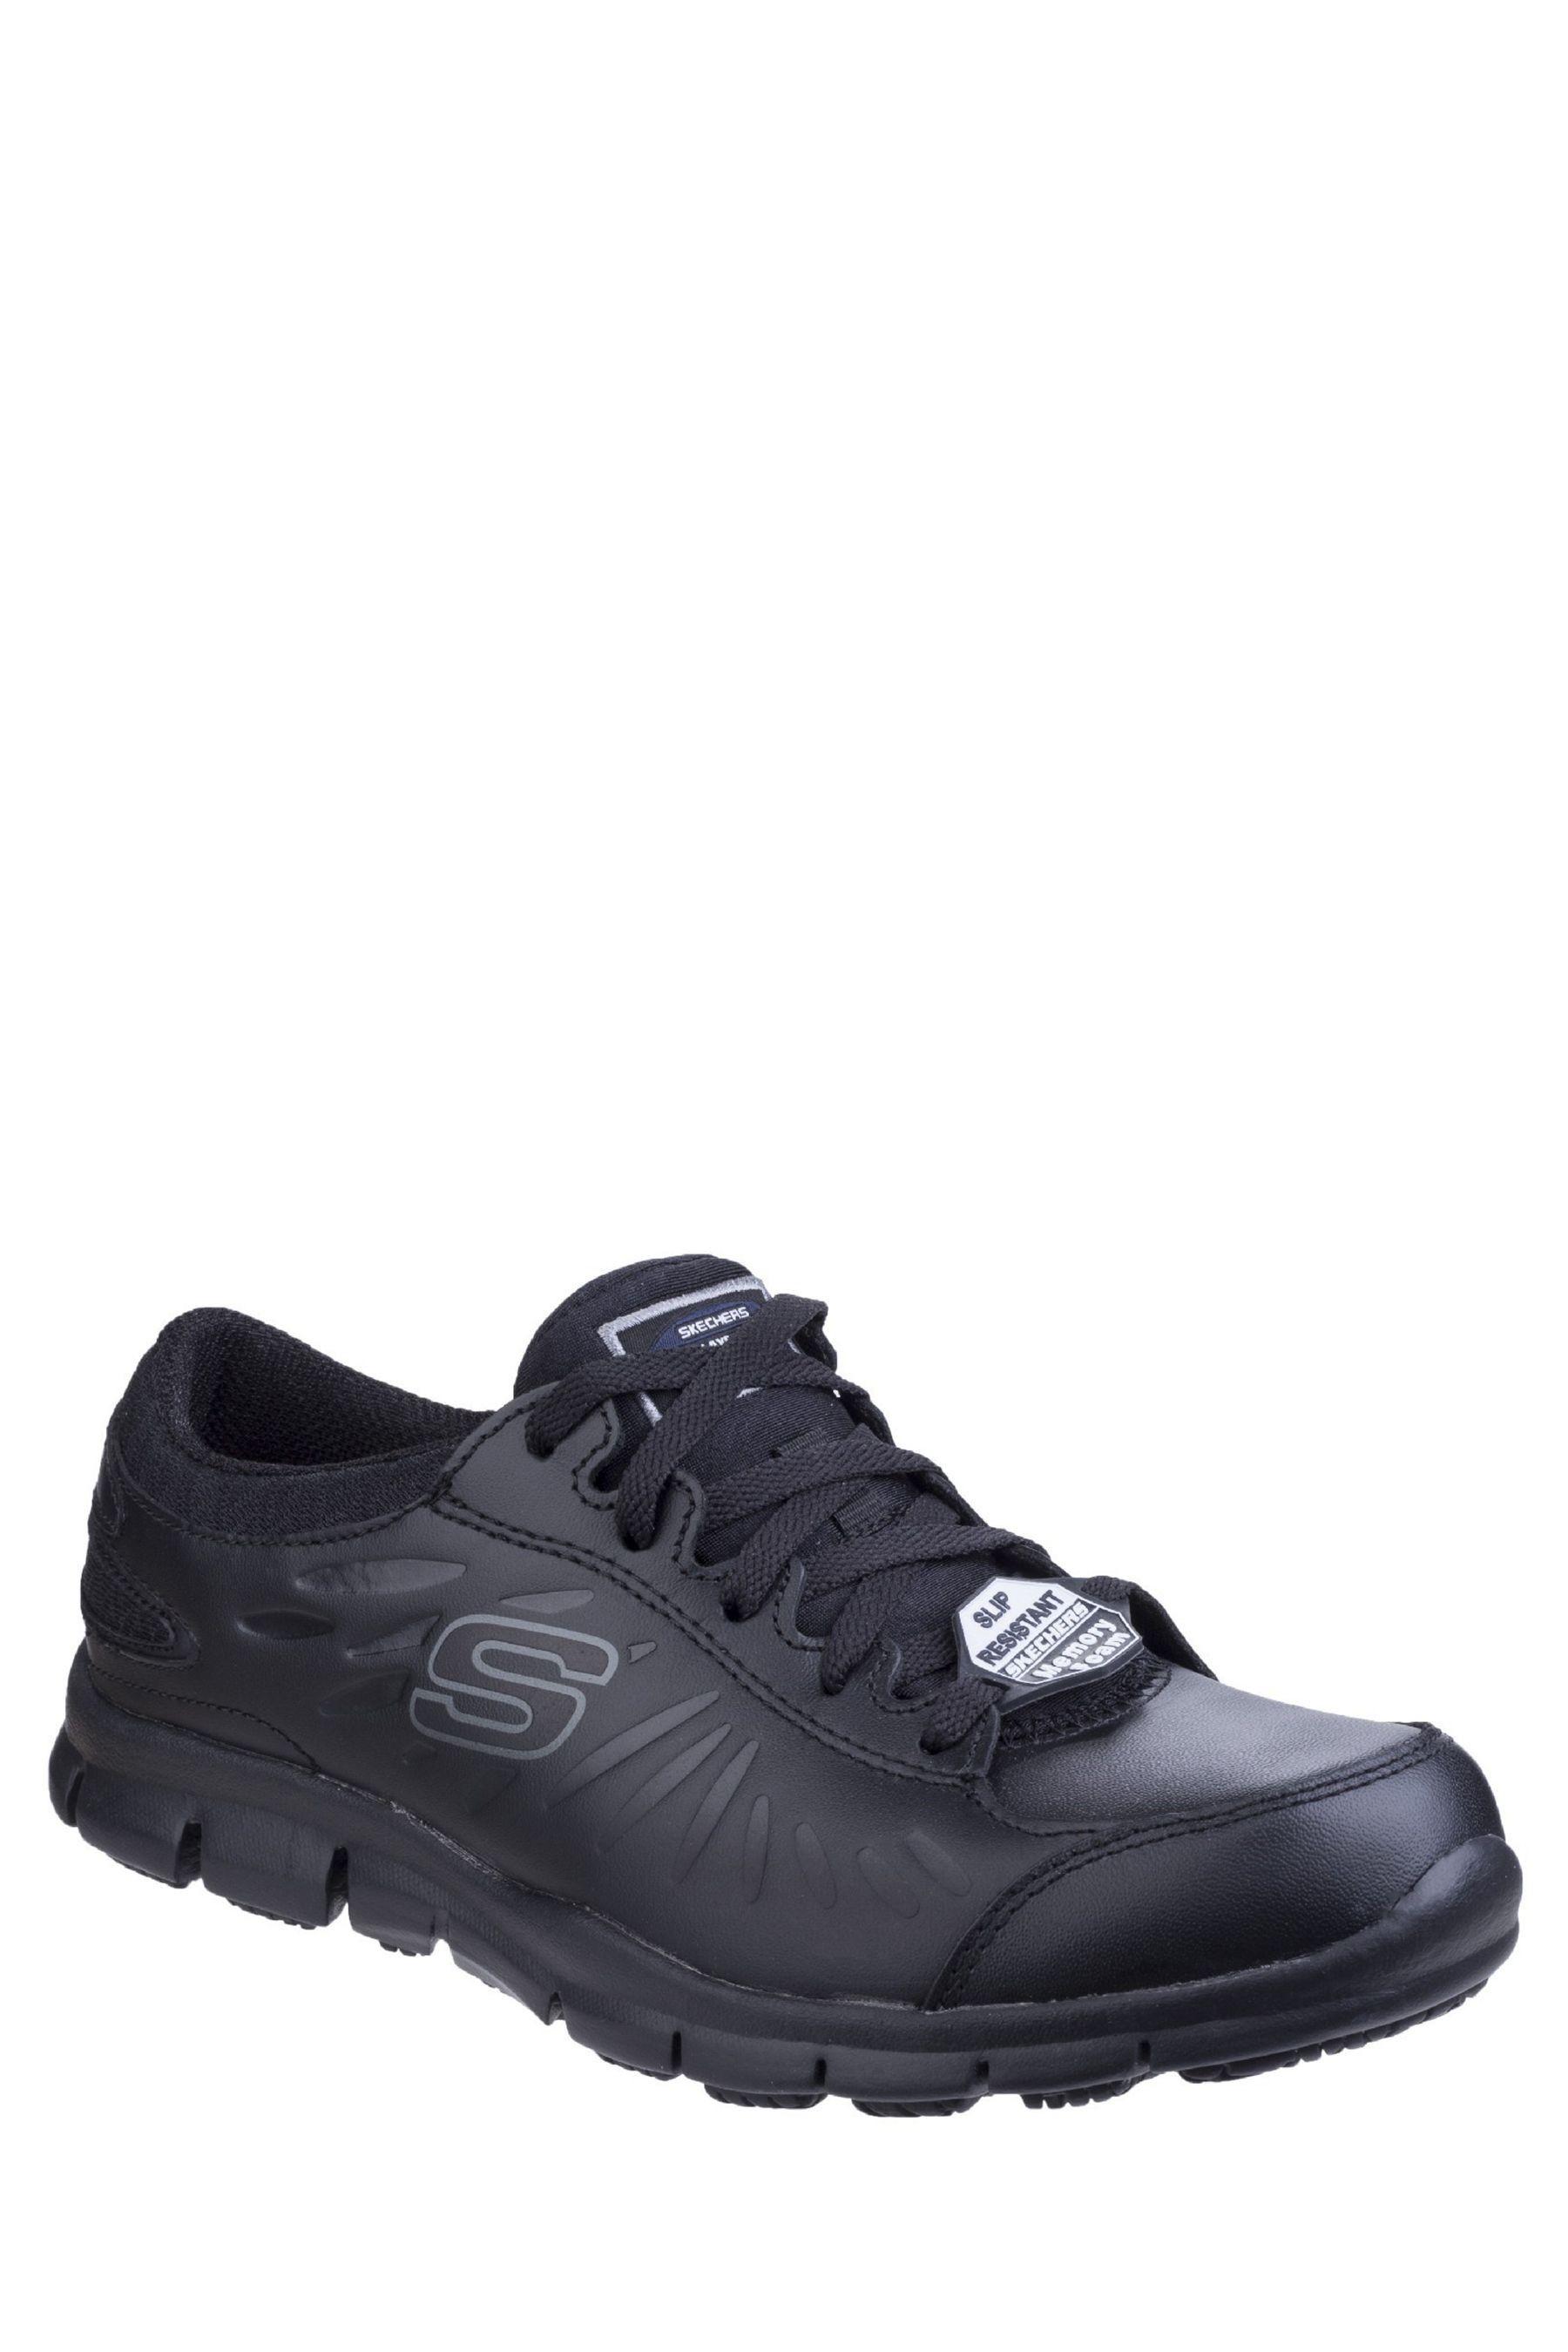 Womens Skechers Eldred Slip Resistant Lace Up Work Shoes Black